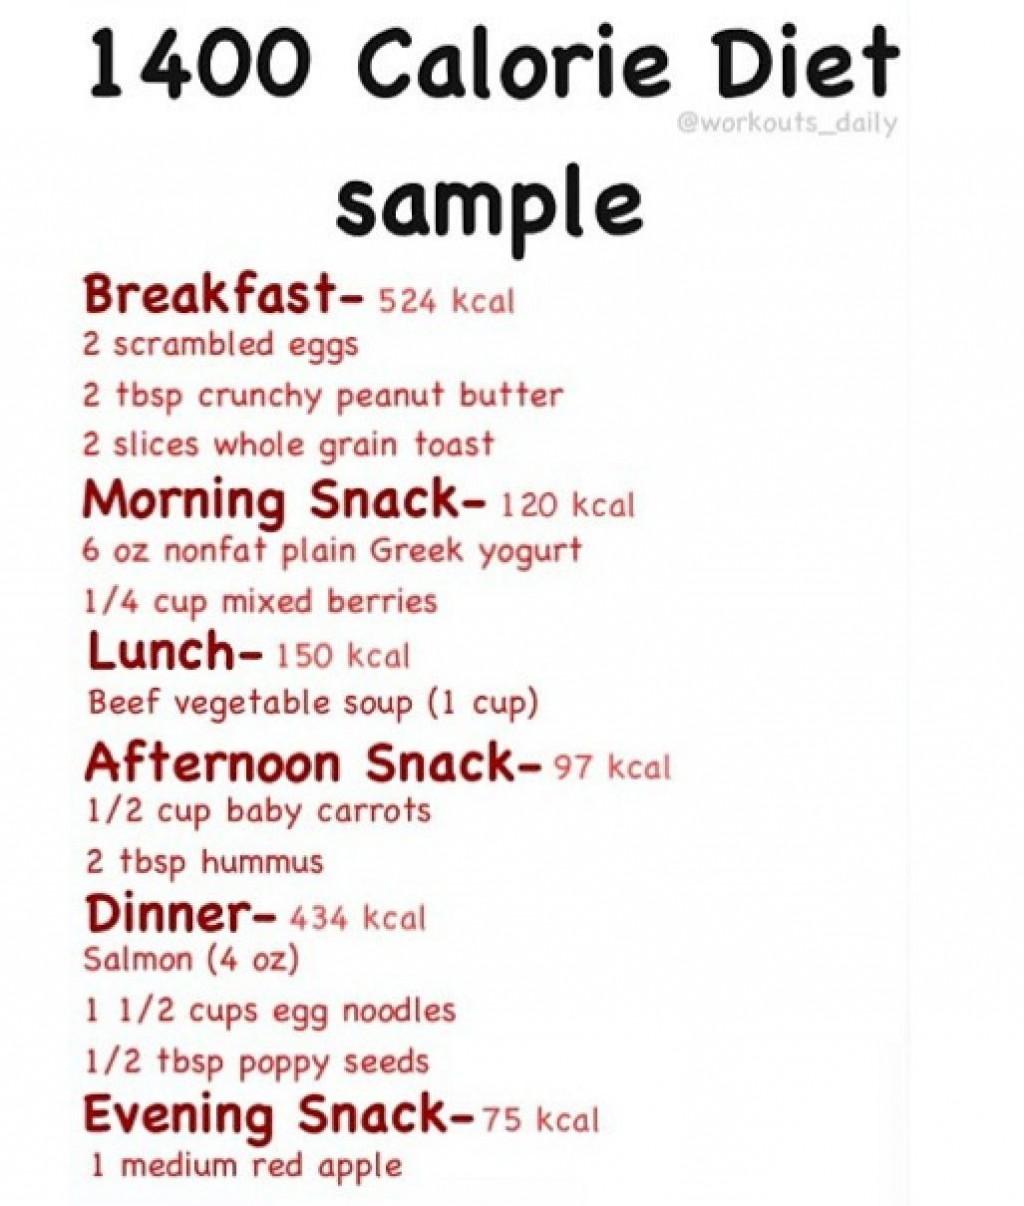 001 Incredible 1400 Calorie Sample Meal Plan Pdf Design Large